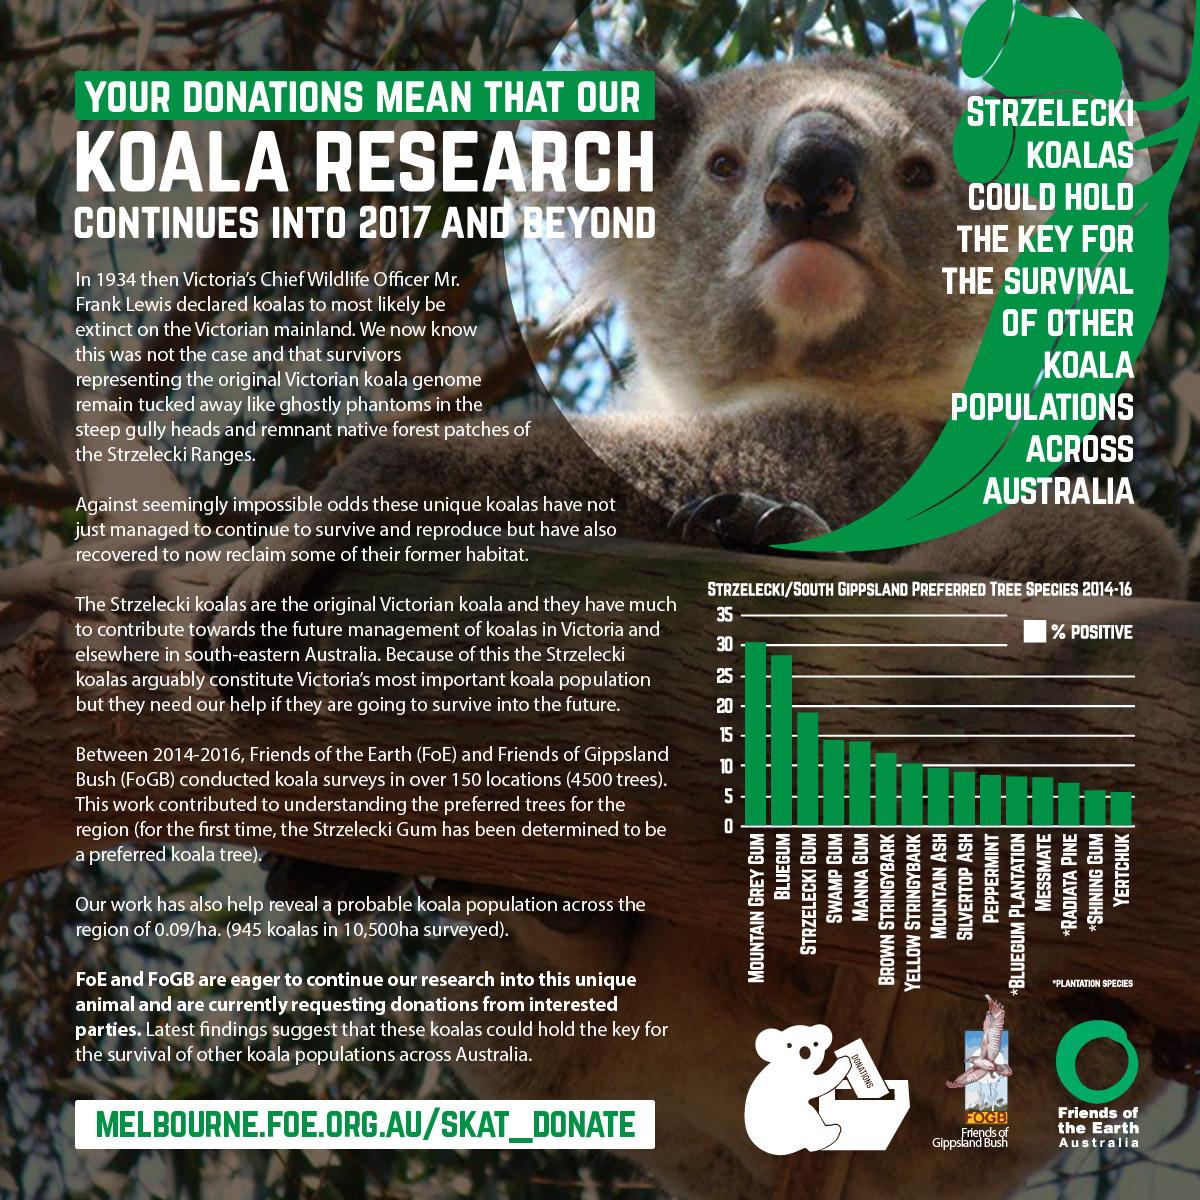 koala-donations-posterWEB.jpg